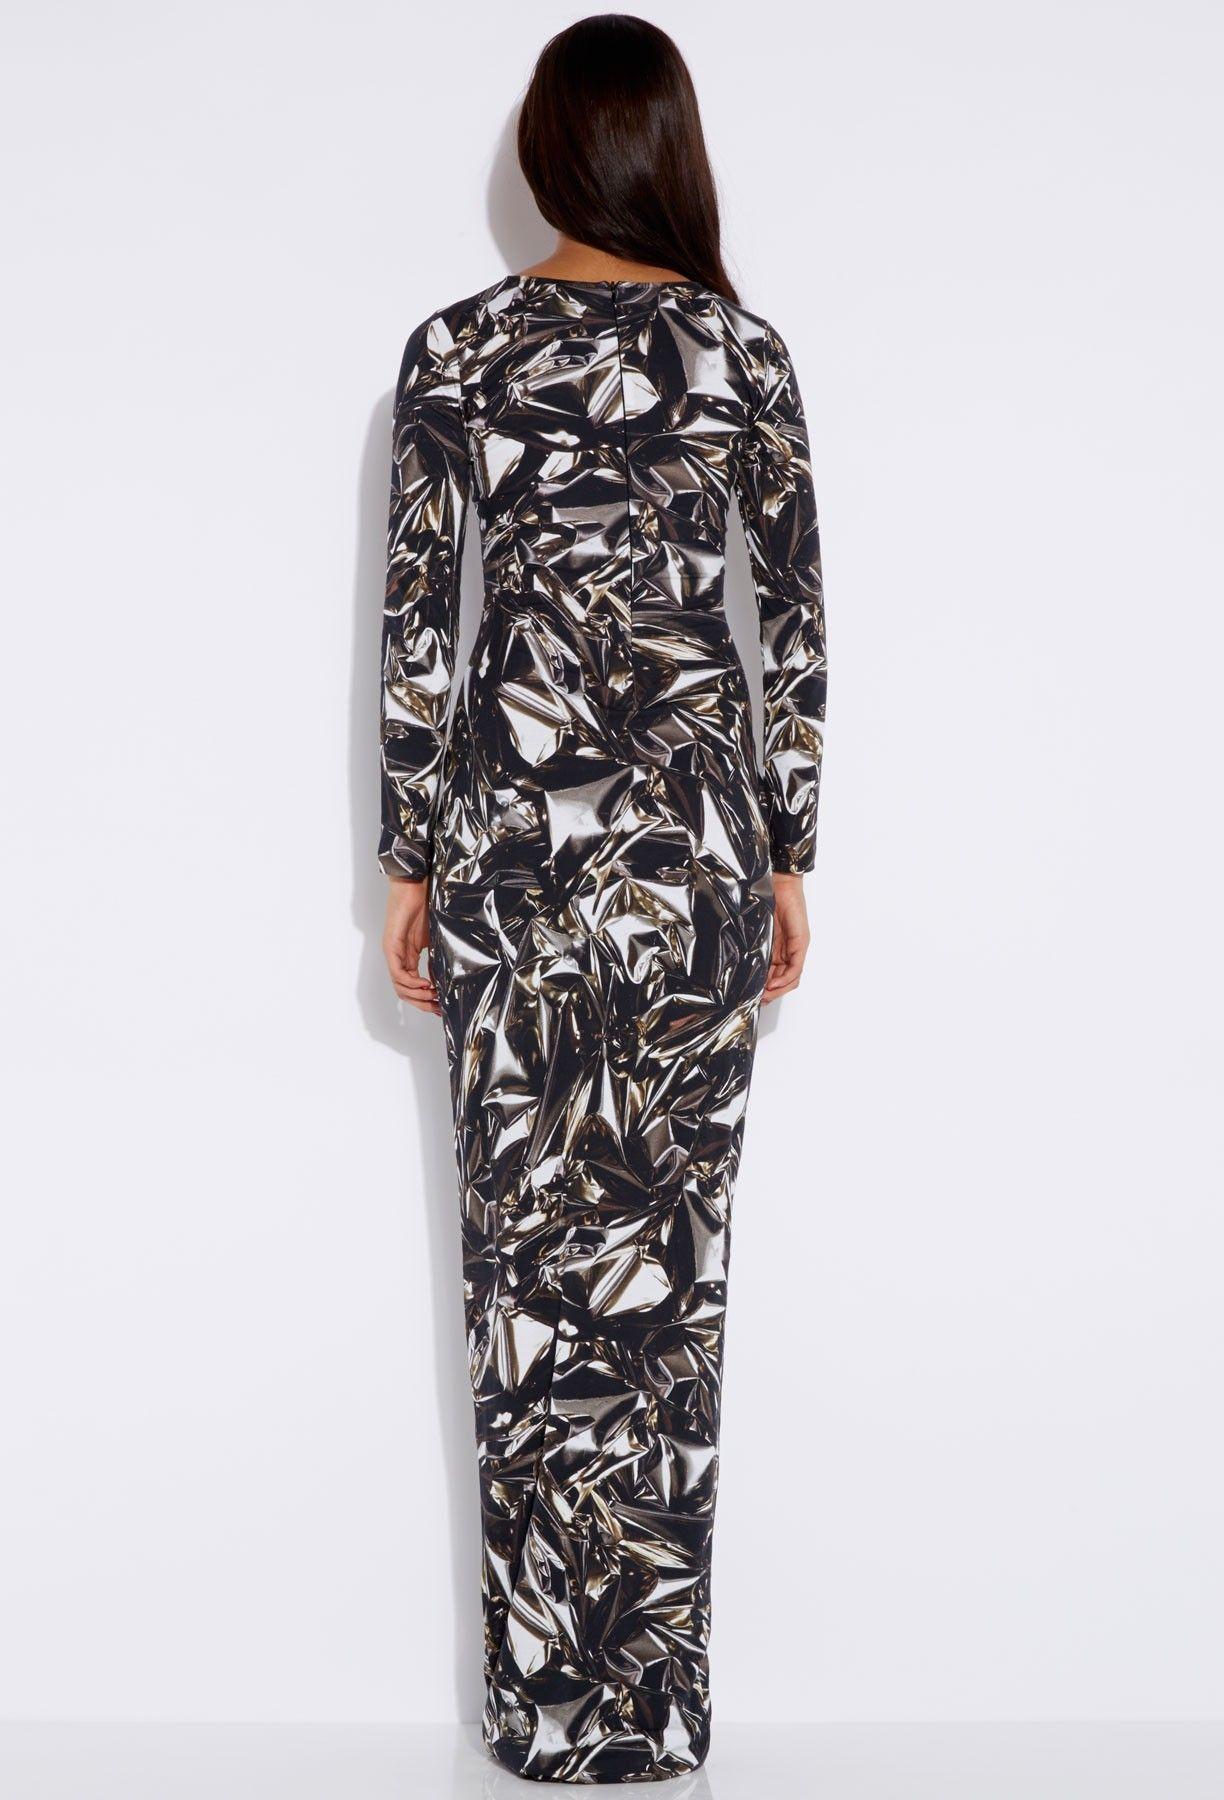 Bree metallica silver bodycon maxi dress aqaq dresses pinterest